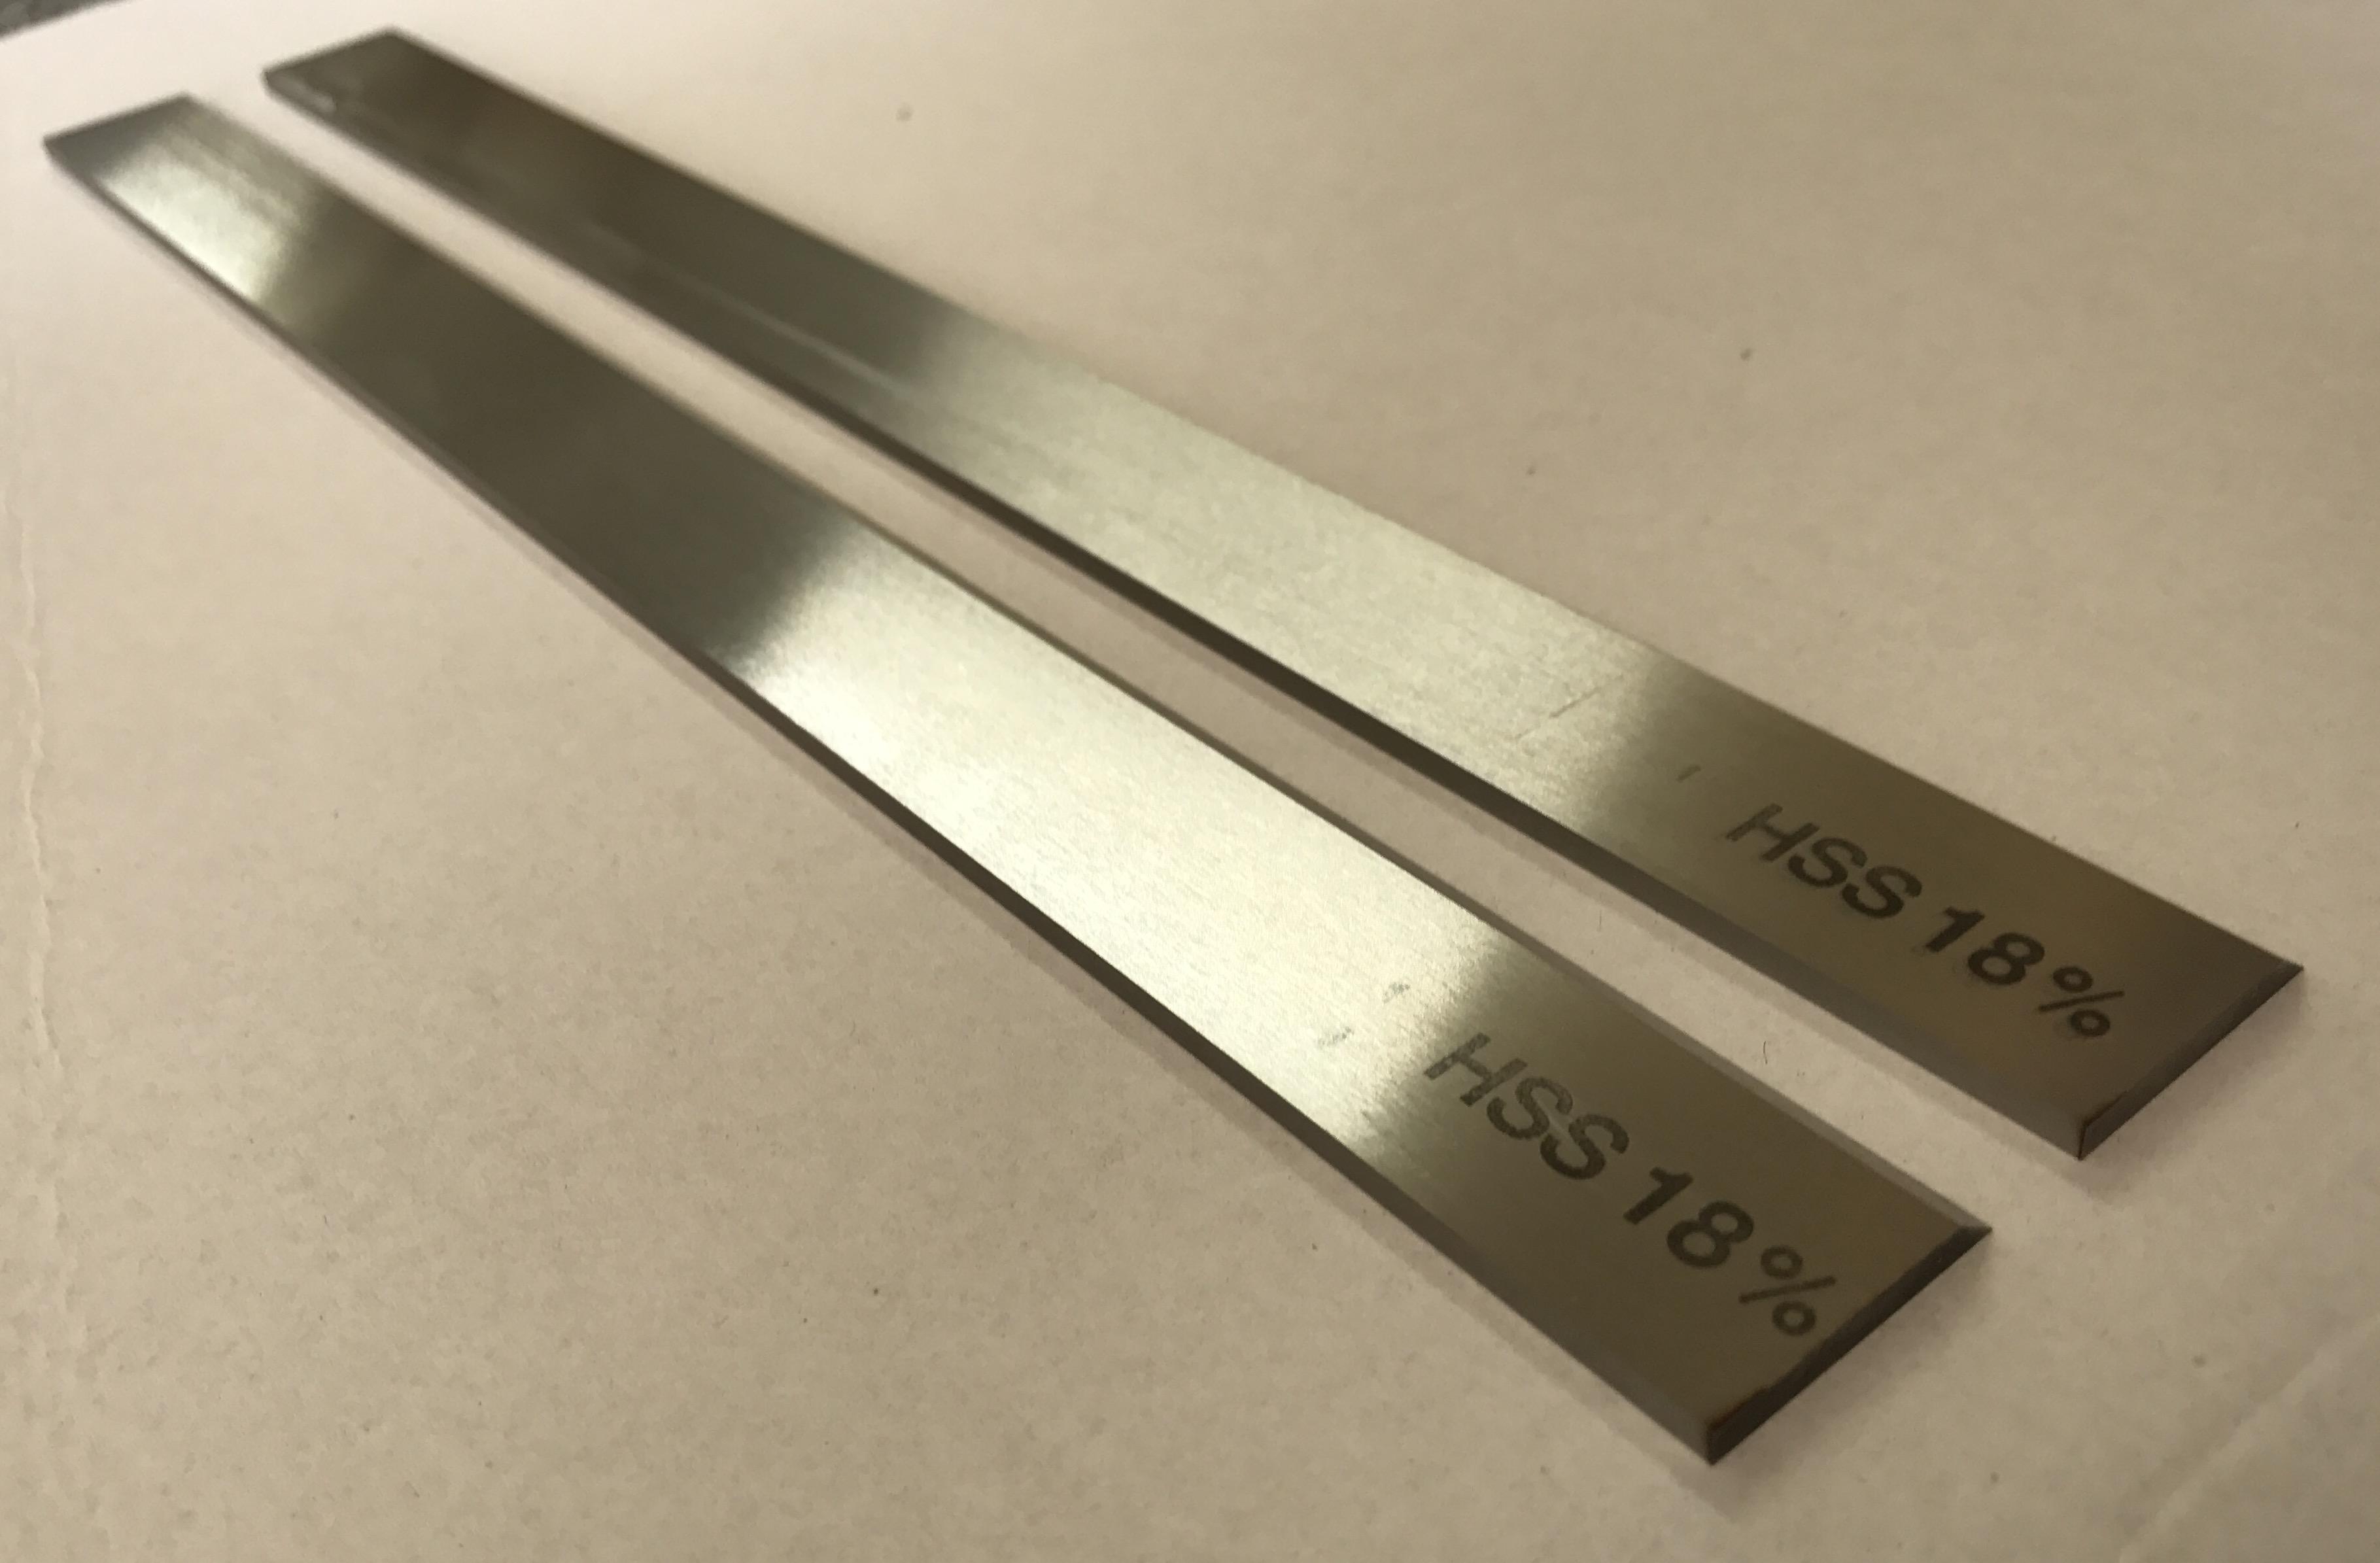 2x-Streifenhobelmesser-18%-HSS 260mmx20mmx3mm